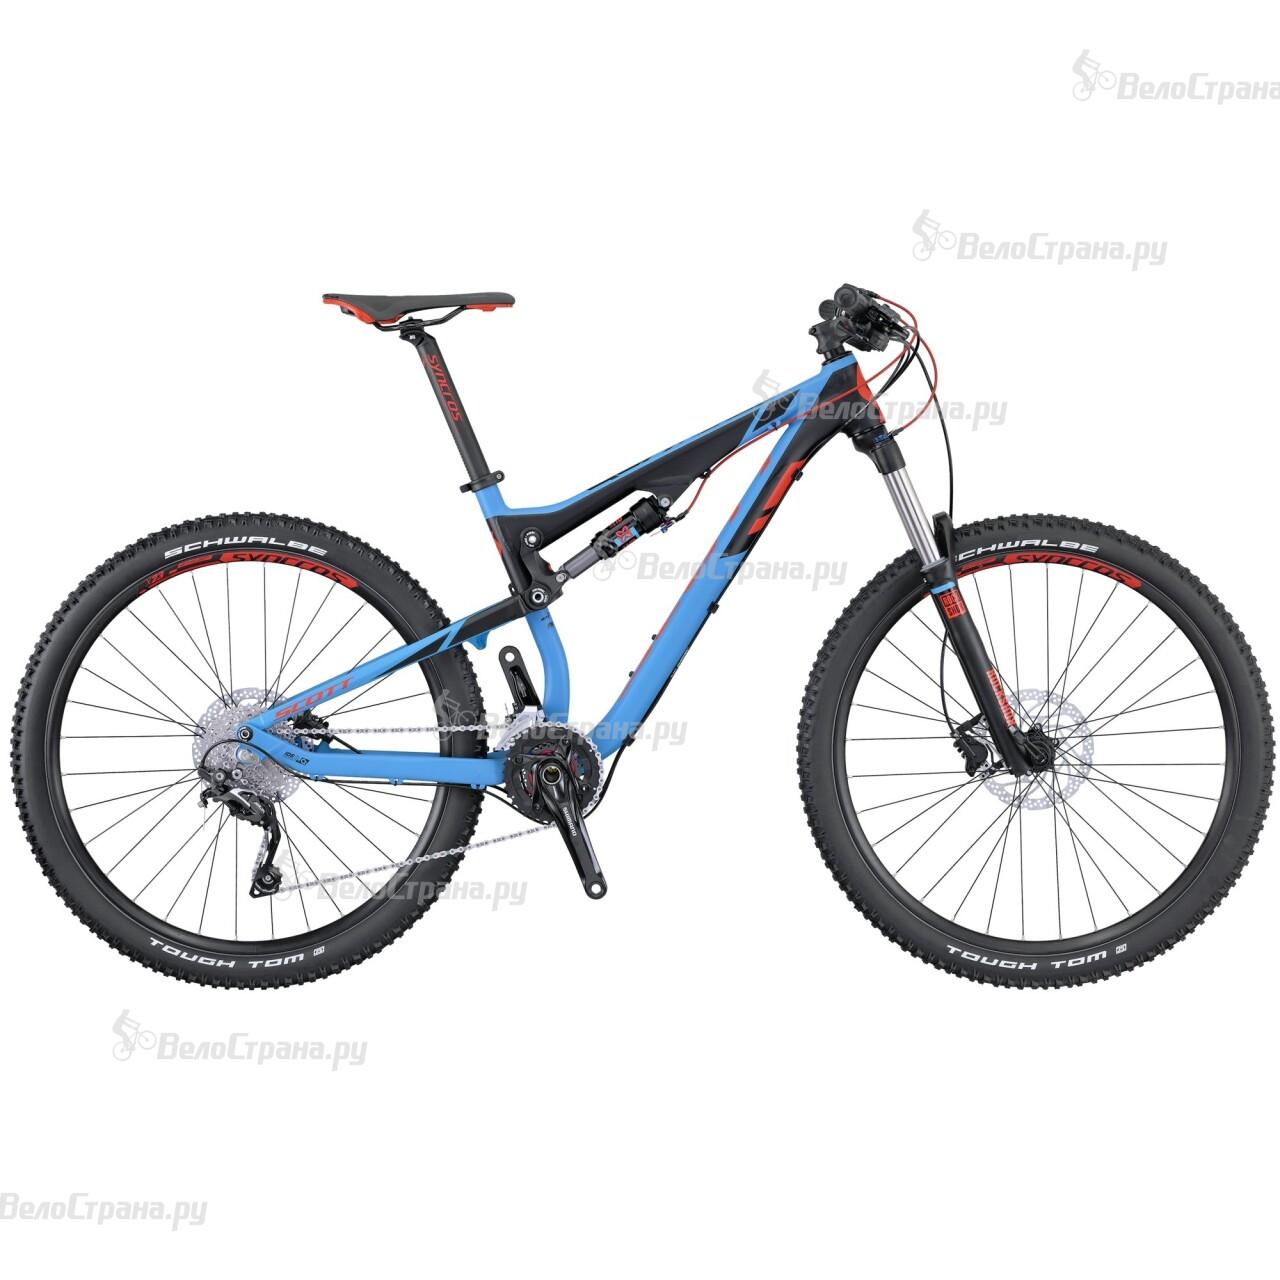 Велосипед Scott Genius 950 (2016) велосипед scott genius 950 2015